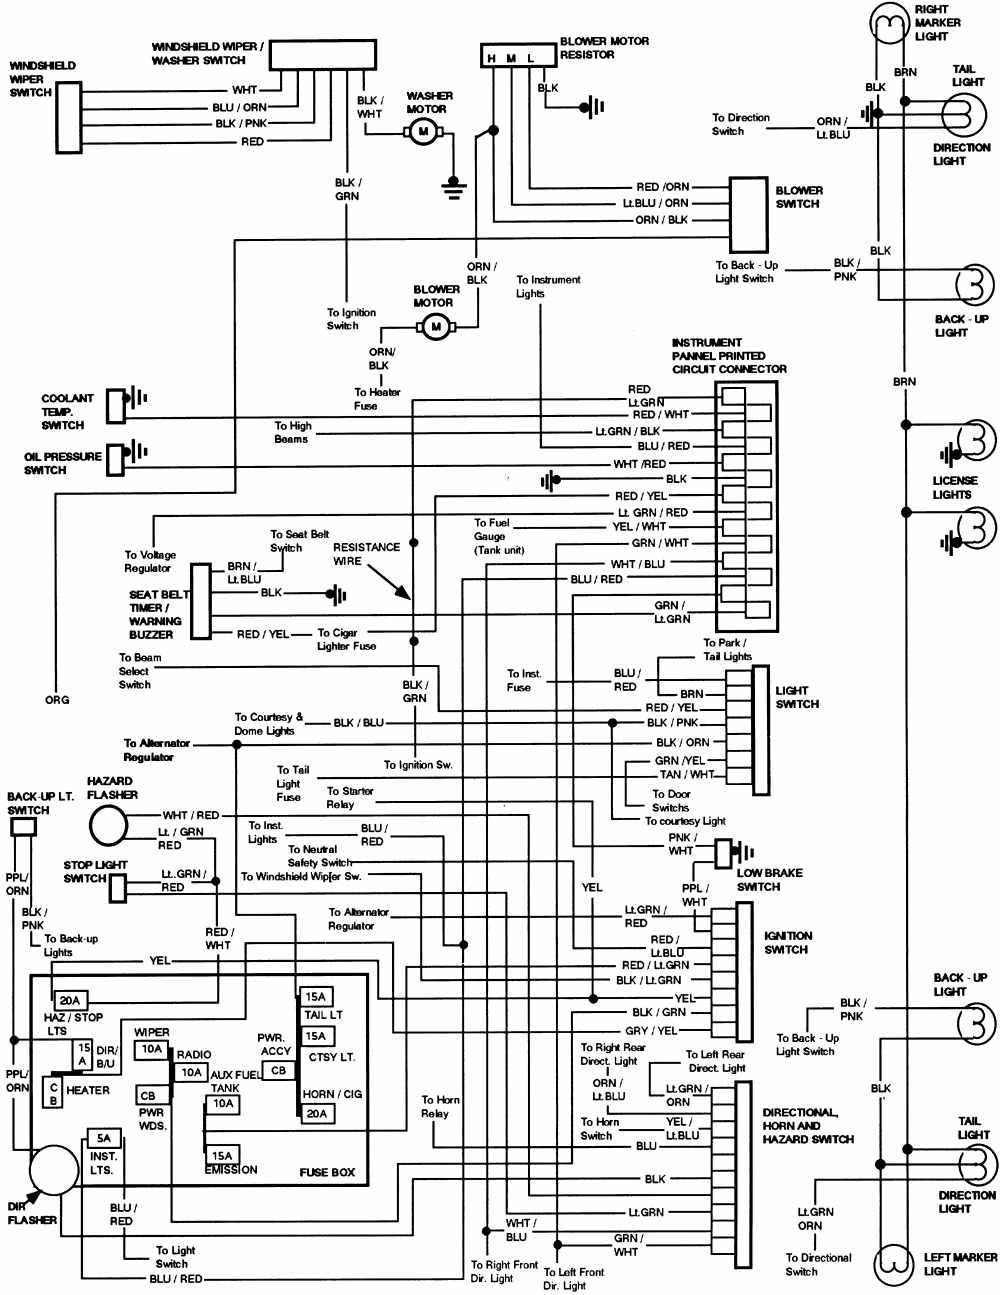 79 f150 wiring diagram 79 wiring diagram